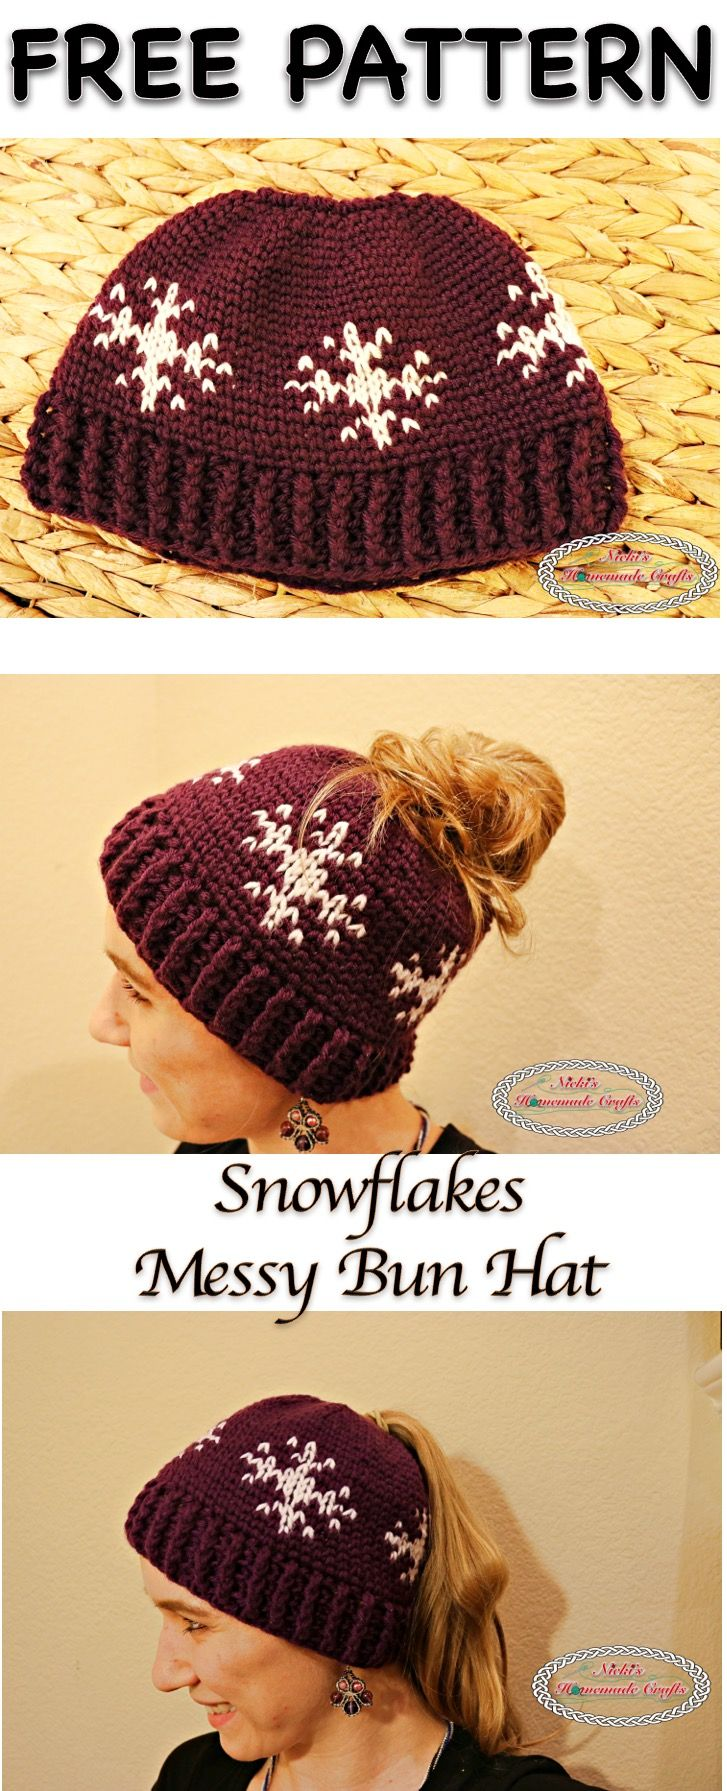 Snowflakes Messy Bun Hat - Free Crochet Pattern by Nicki\'s Homemade ...